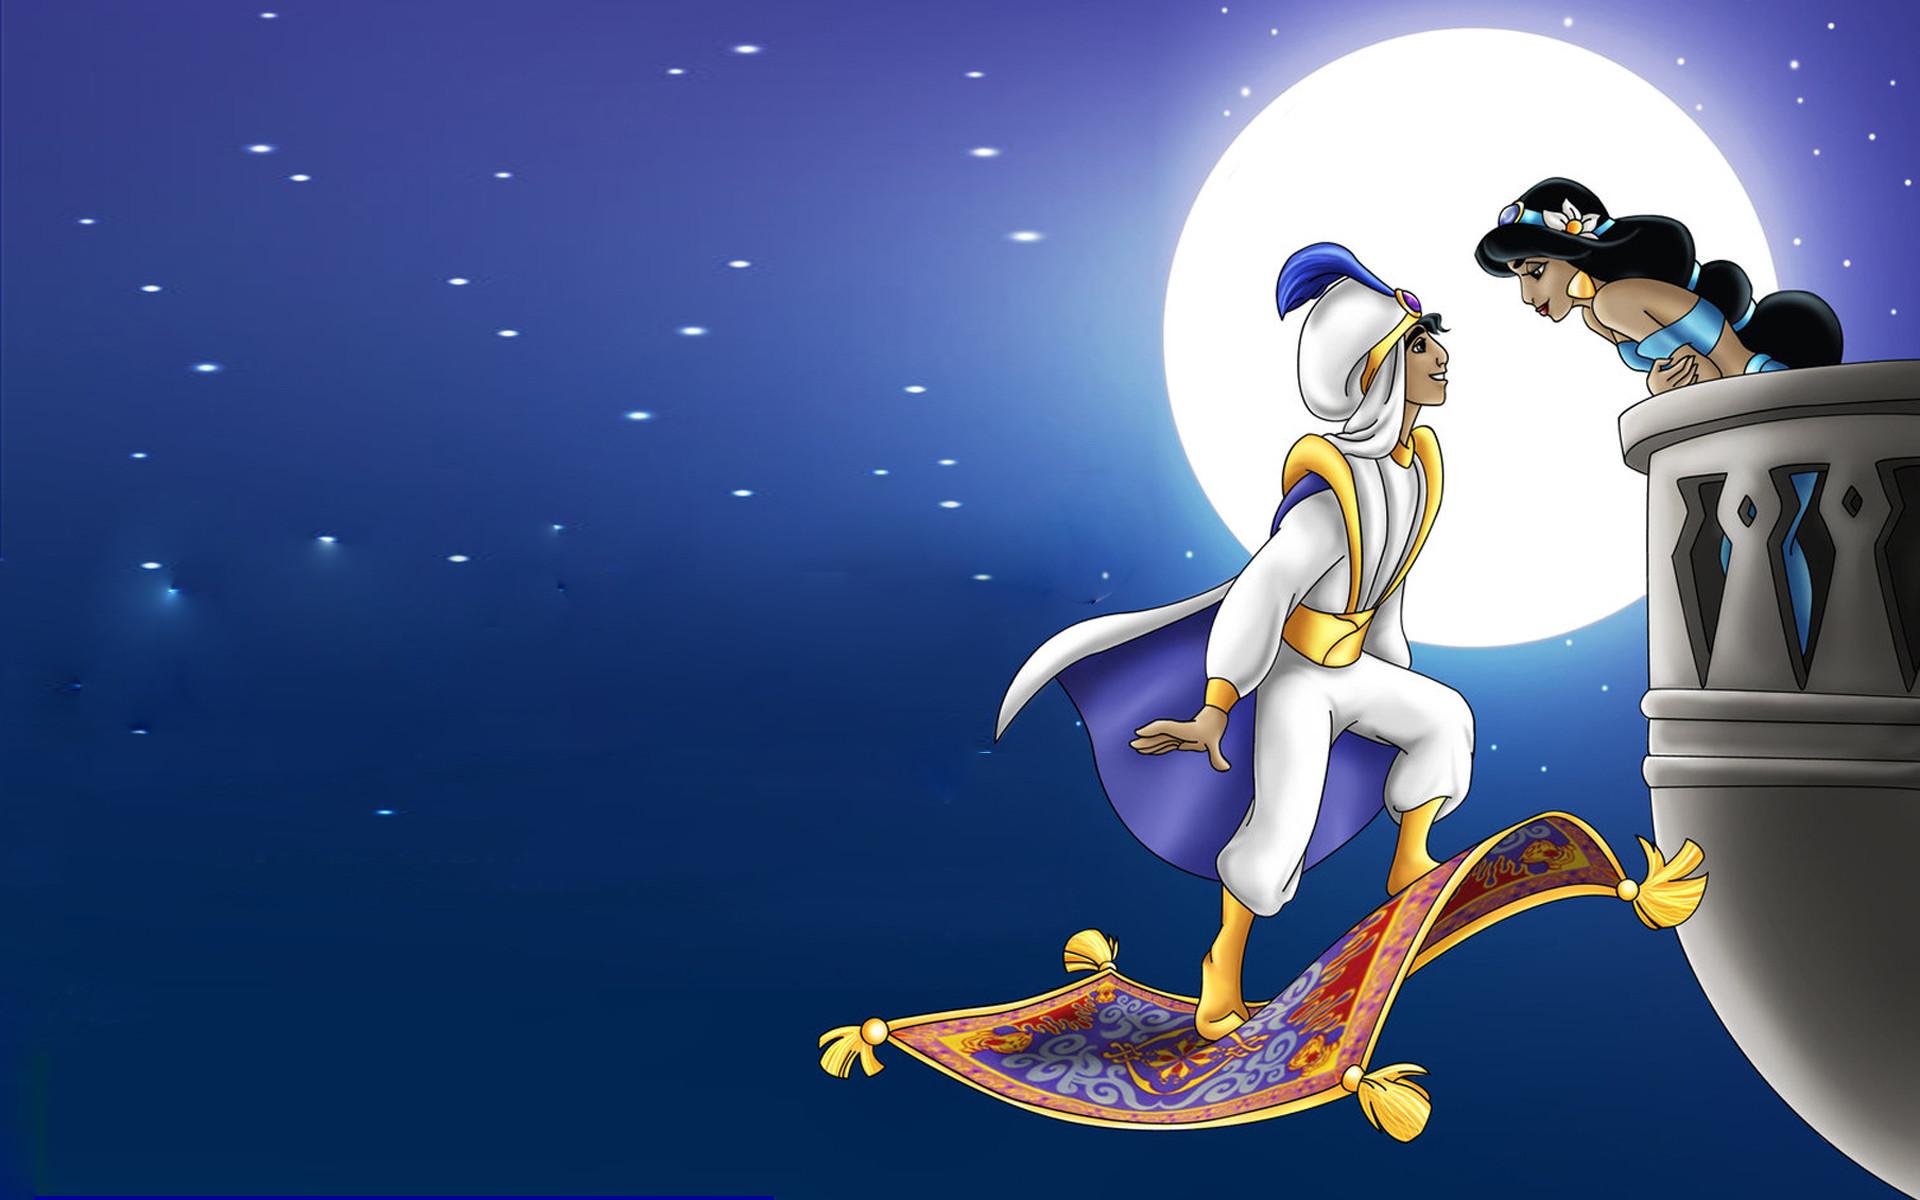 Res: 1920x1200, Aladdin And Princess Jasm.